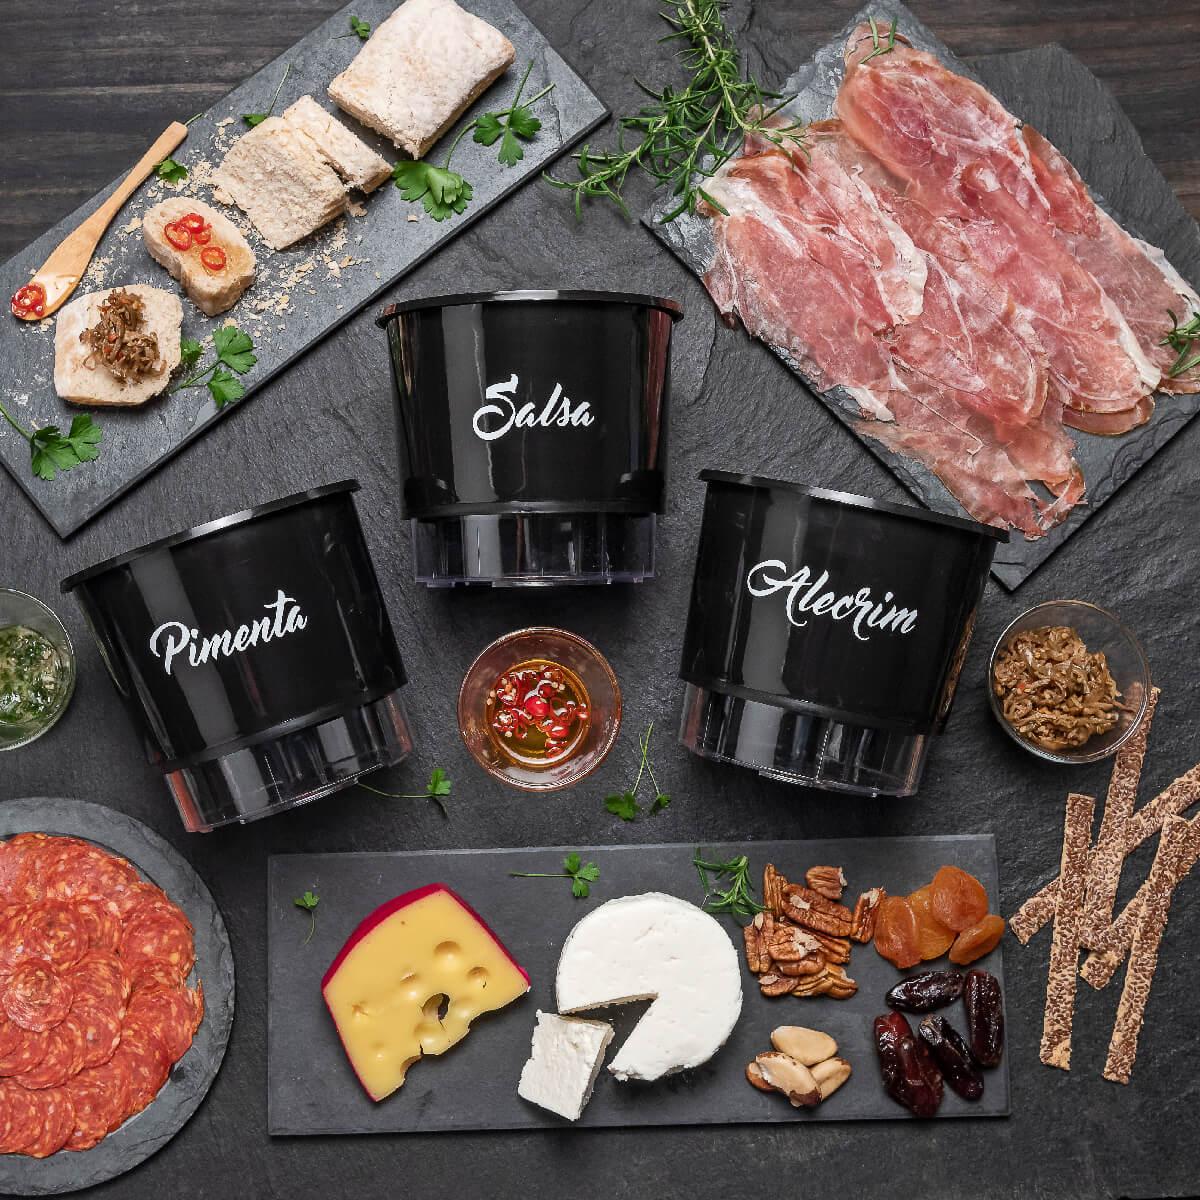 Kit Plantio Completo Gourmet Tábuas  - Vasos Raiz Loja Oficial